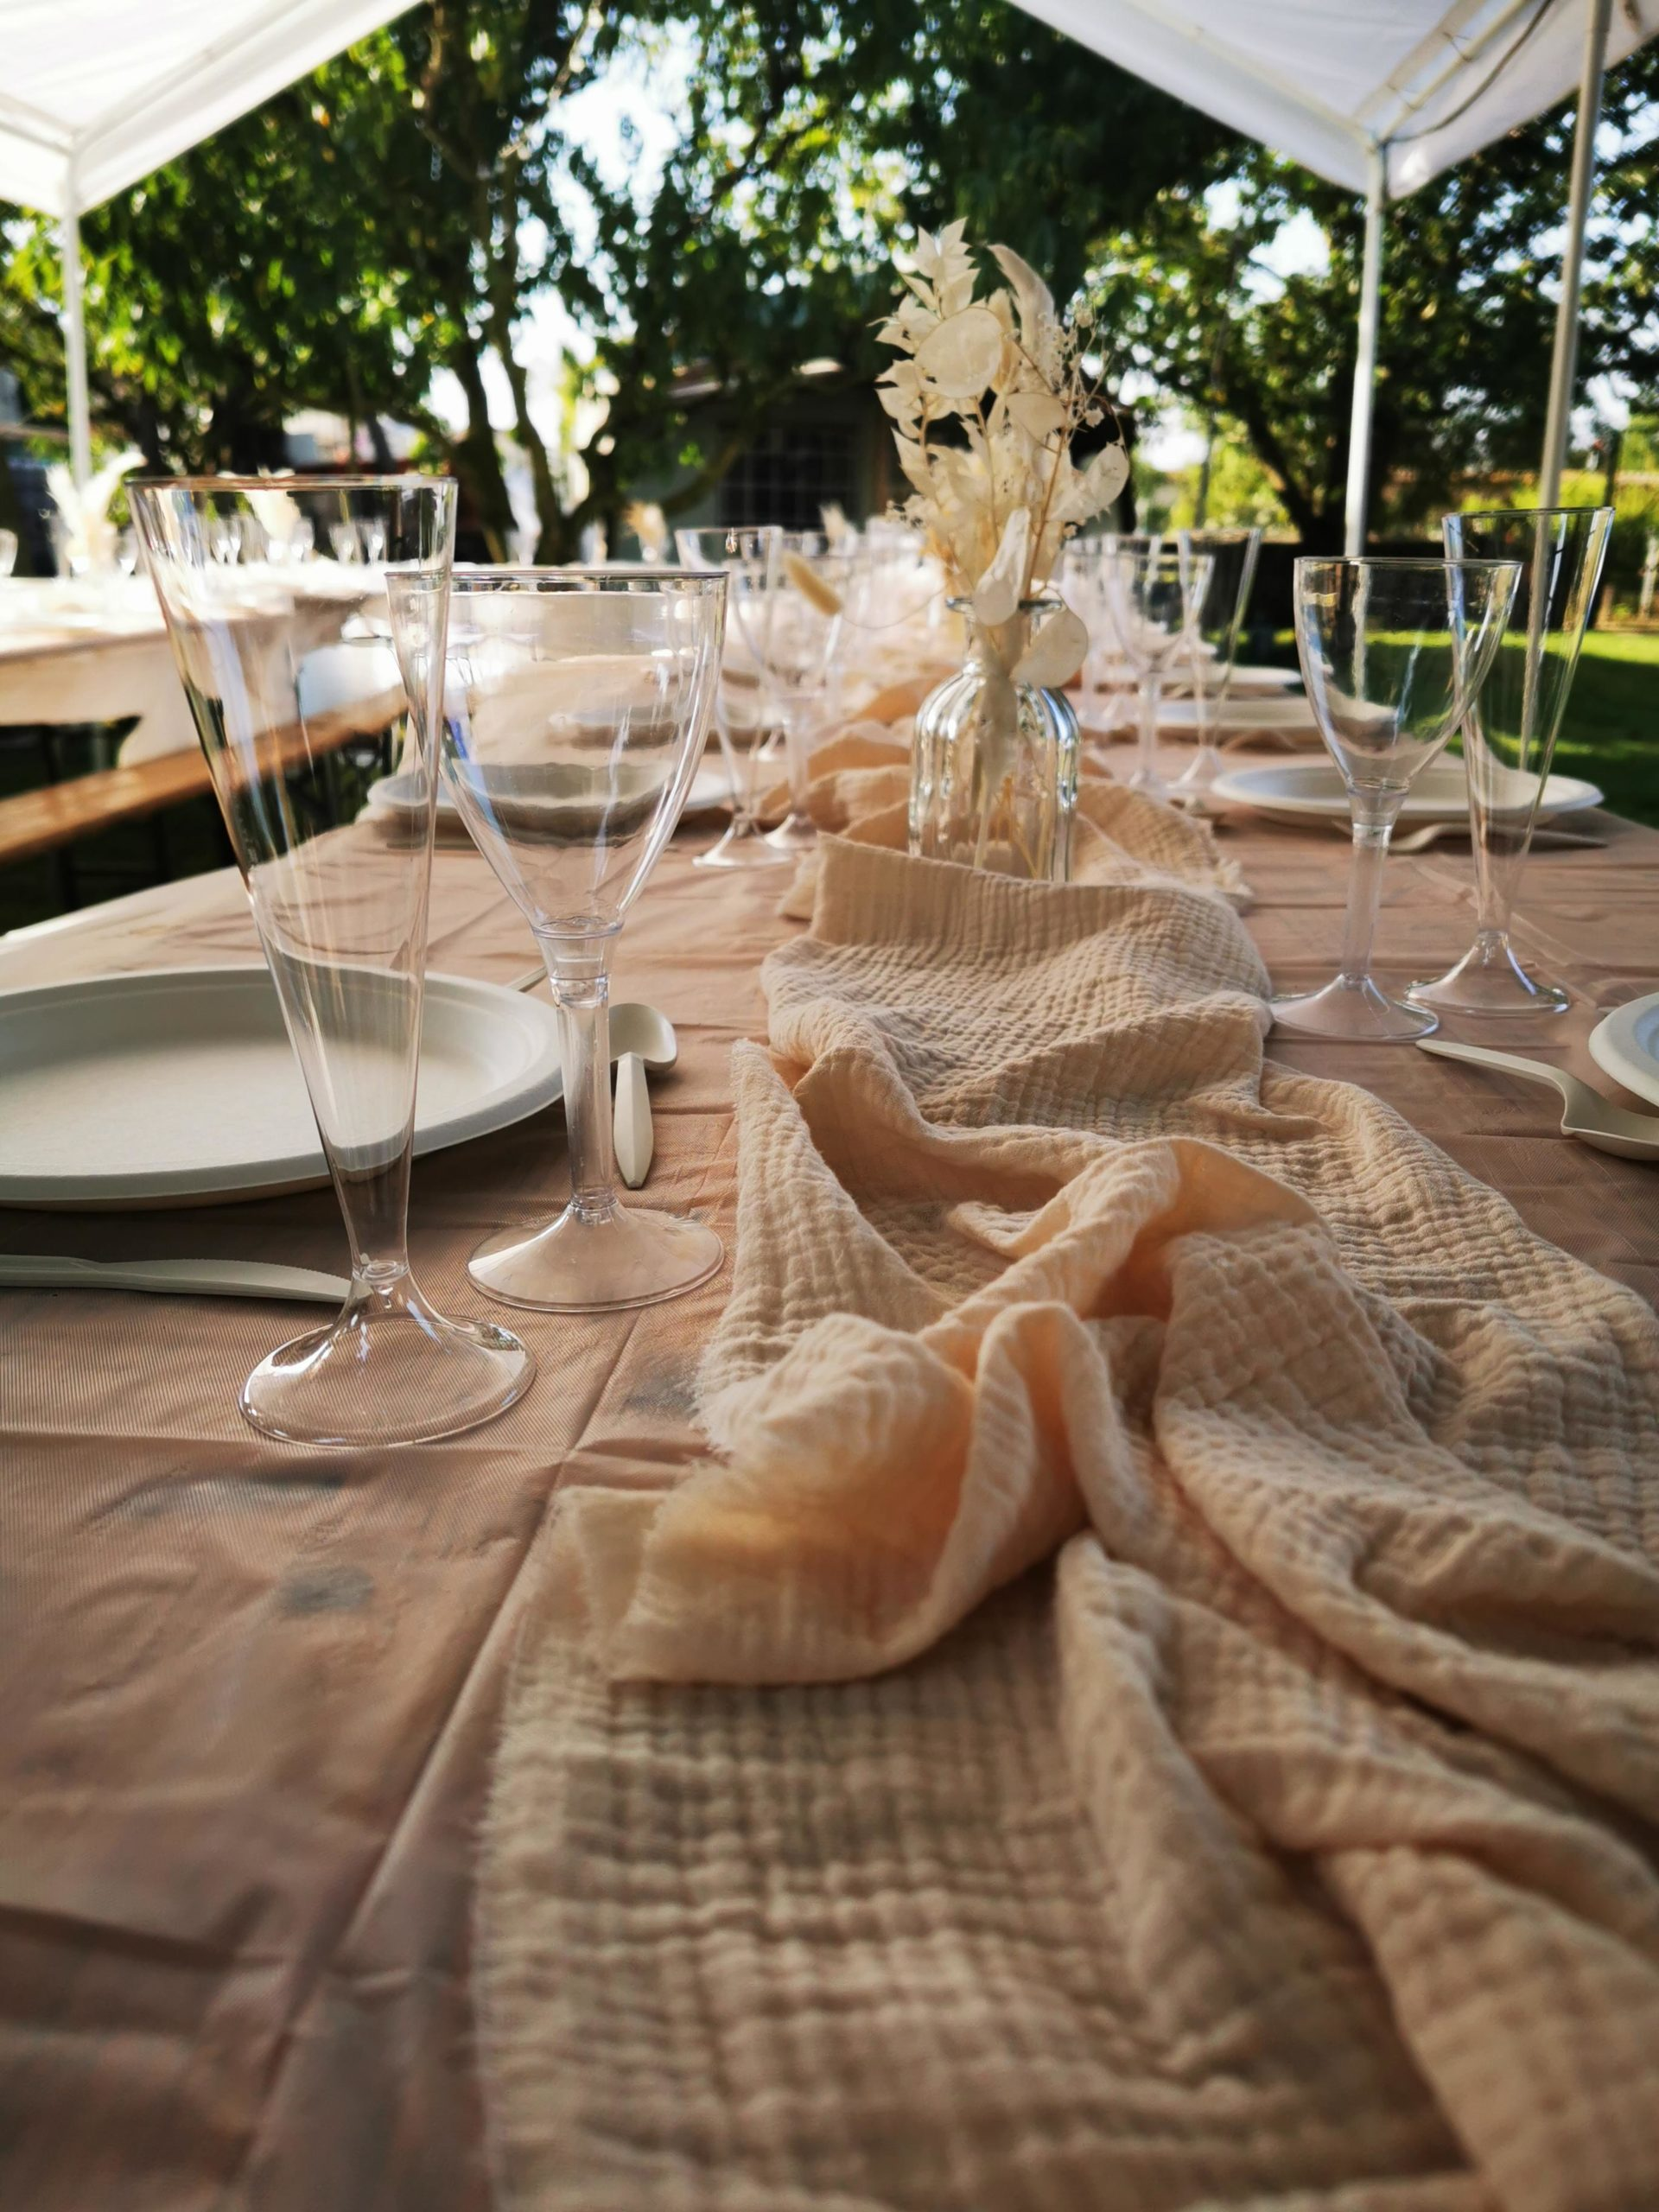 30 ans sabrina coachella – les moments m – wedding planner lyon